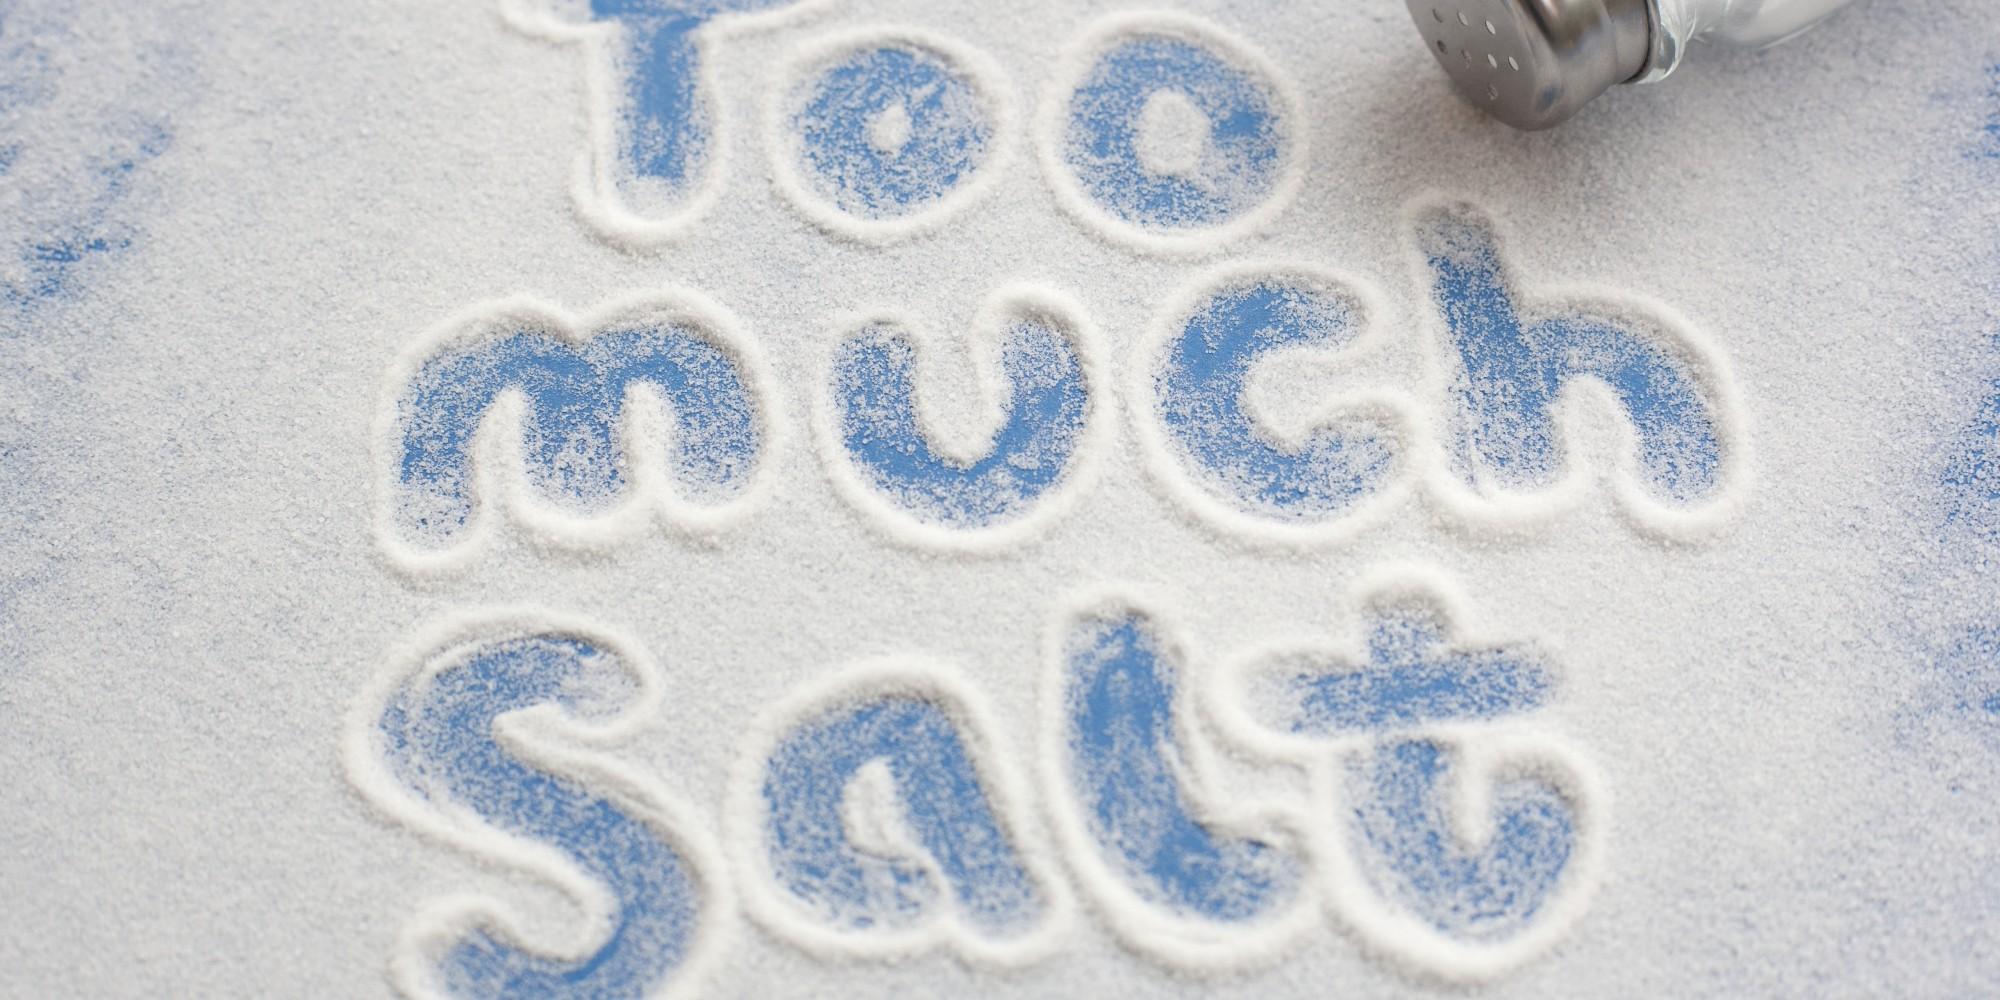 Images of Salt | 2000x1000